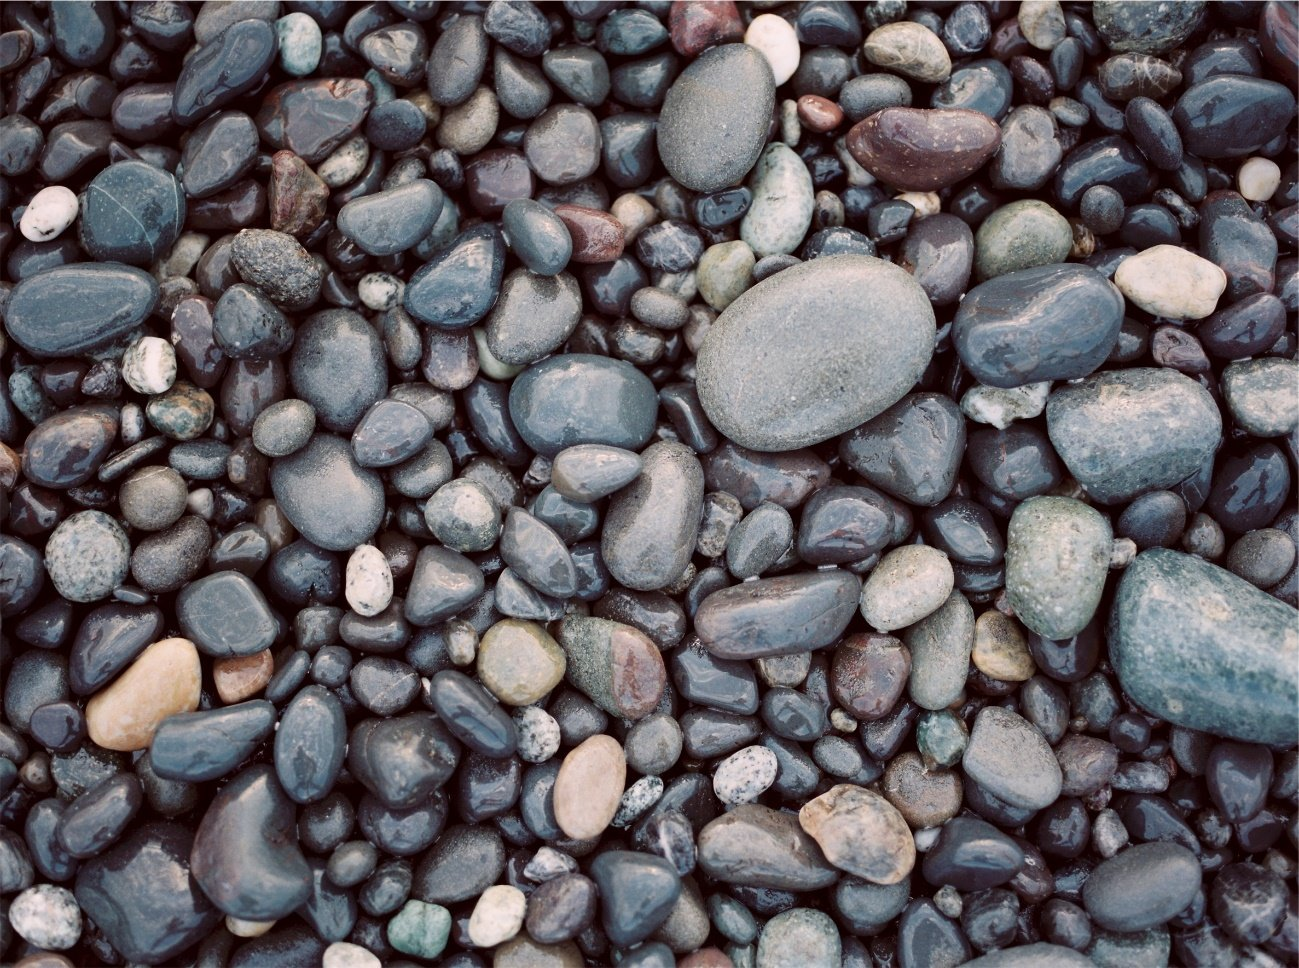 diabetes diferentes tipos de rocas